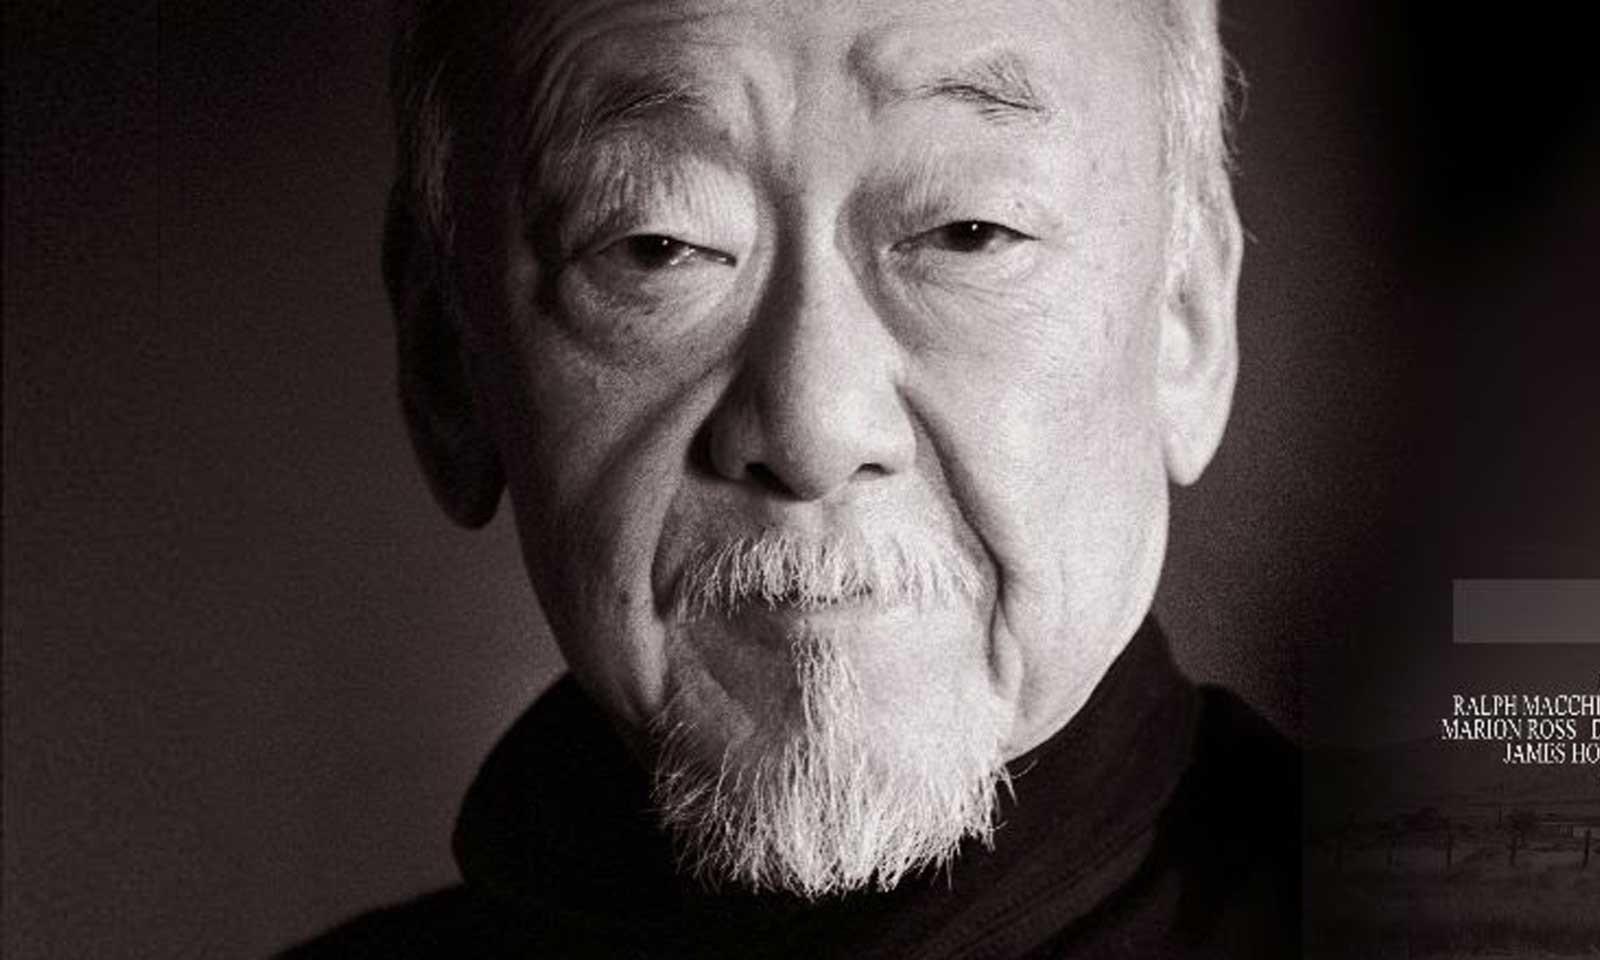 More-Than-Miyagi-The-Pat-Morita-Story-top2